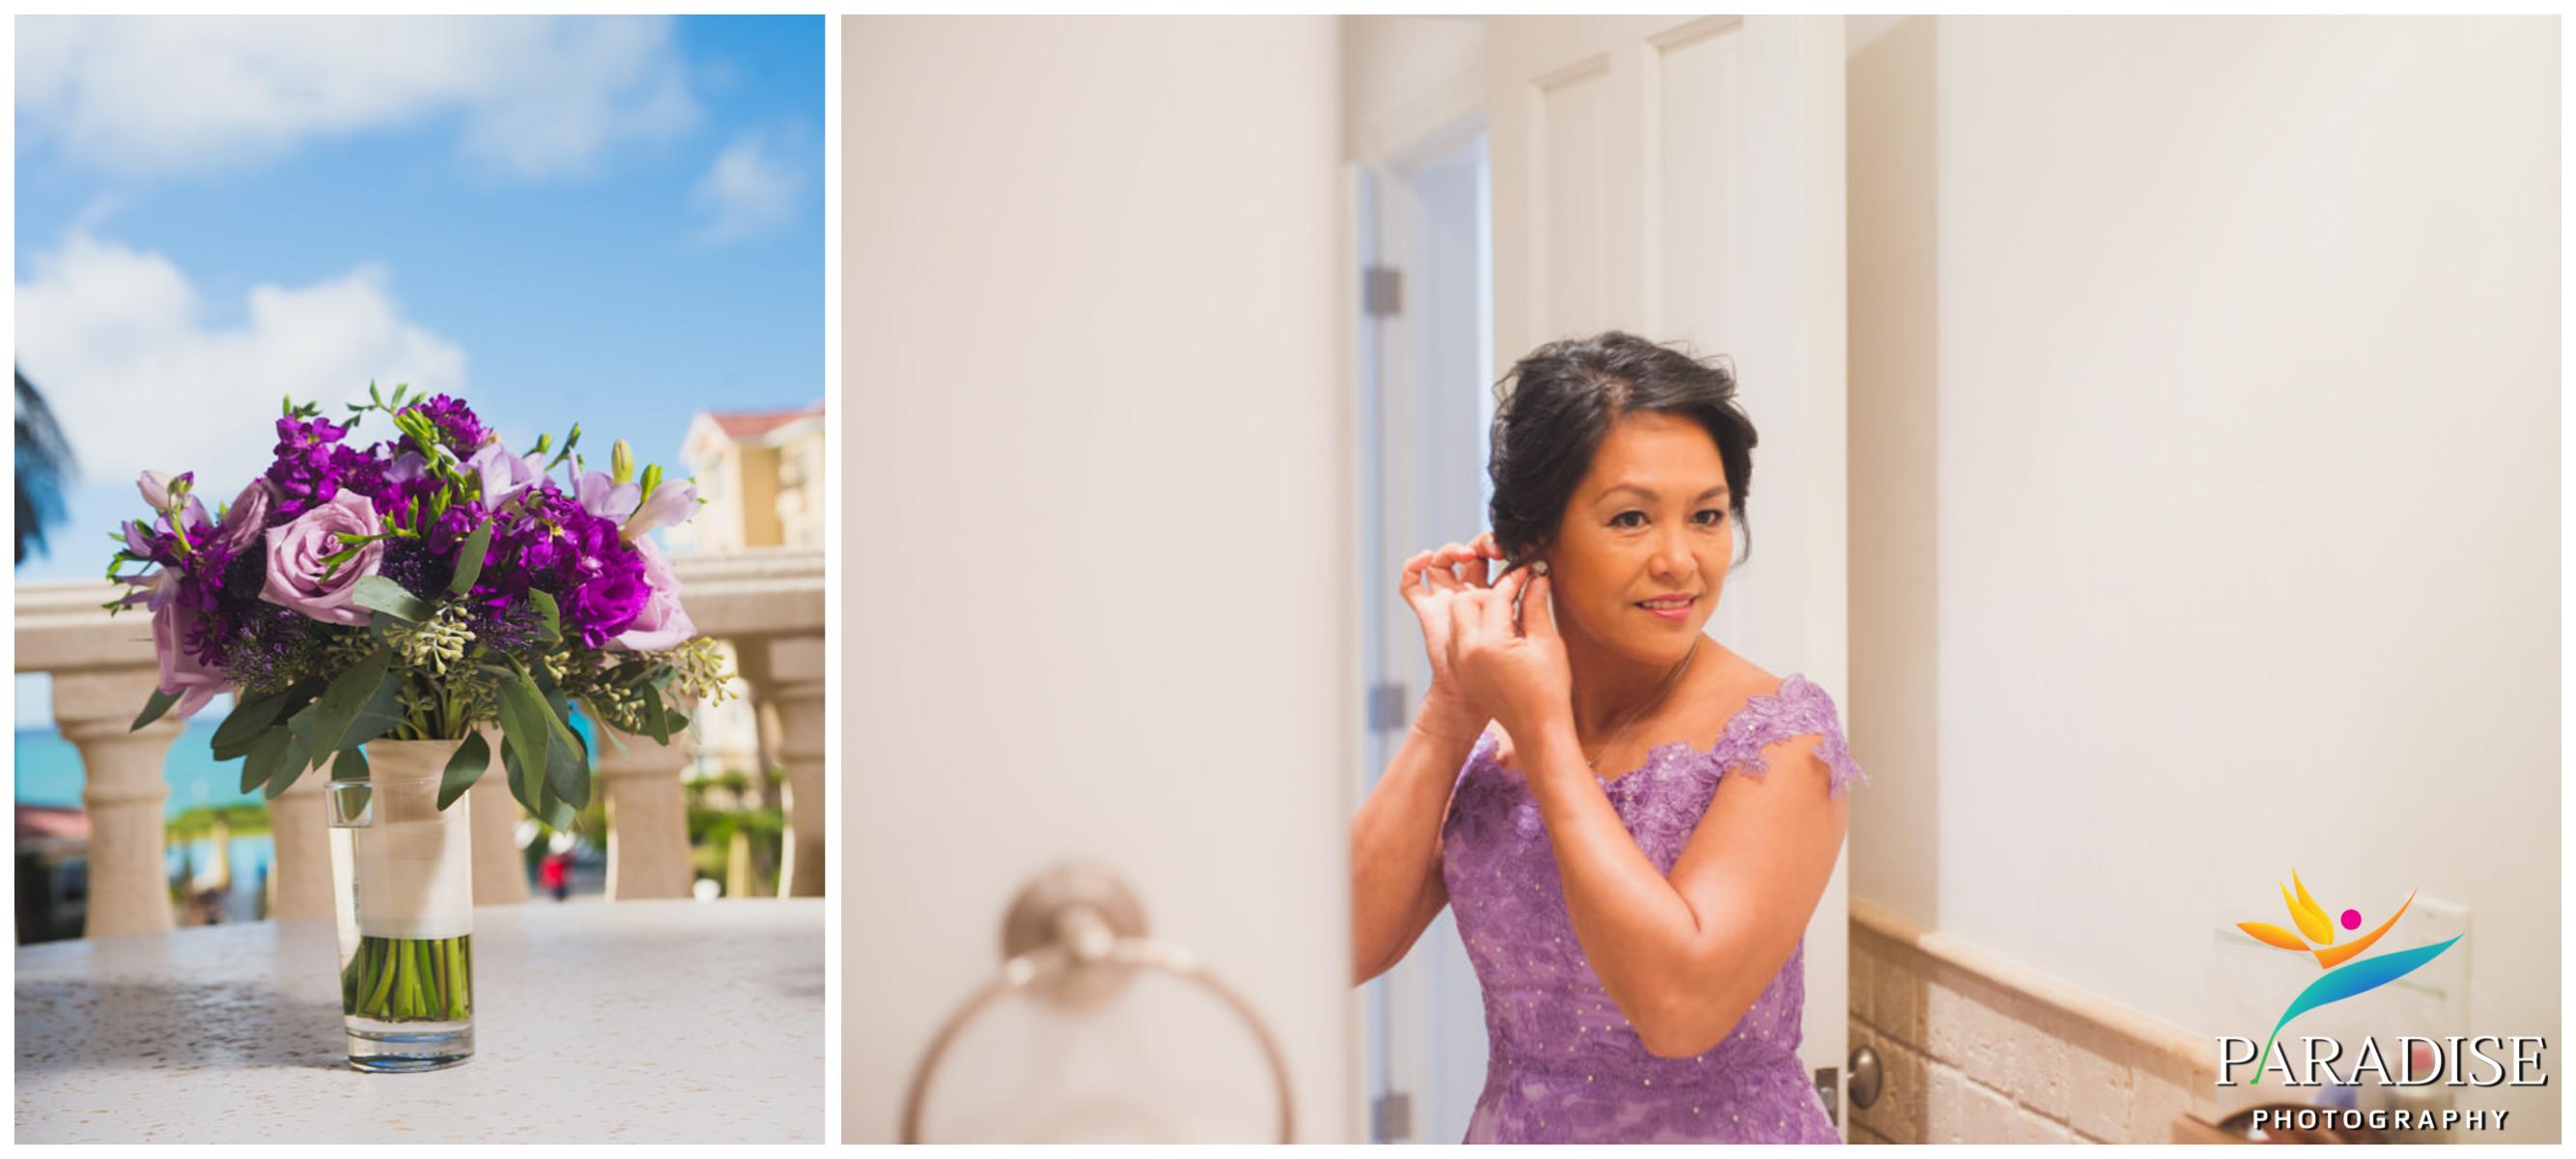 008 destination-wedding-turks-and-caicos-nila-planner-island-caribbean-somerset-bay-bistro-grace-bay-beach